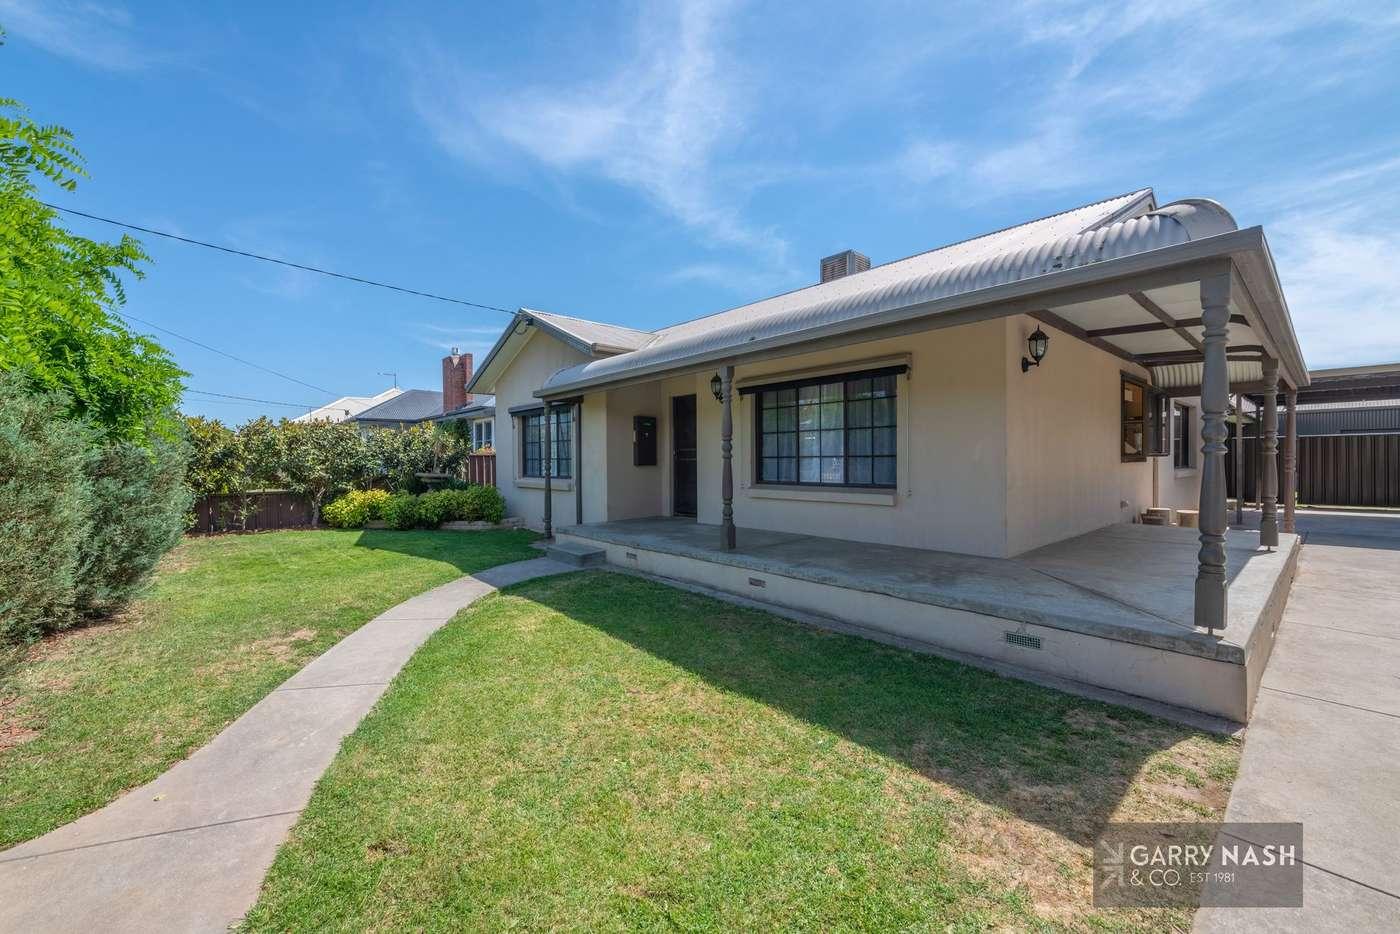 Main view of Homely house listing, 6 George Street, Wangaratta VIC 3677